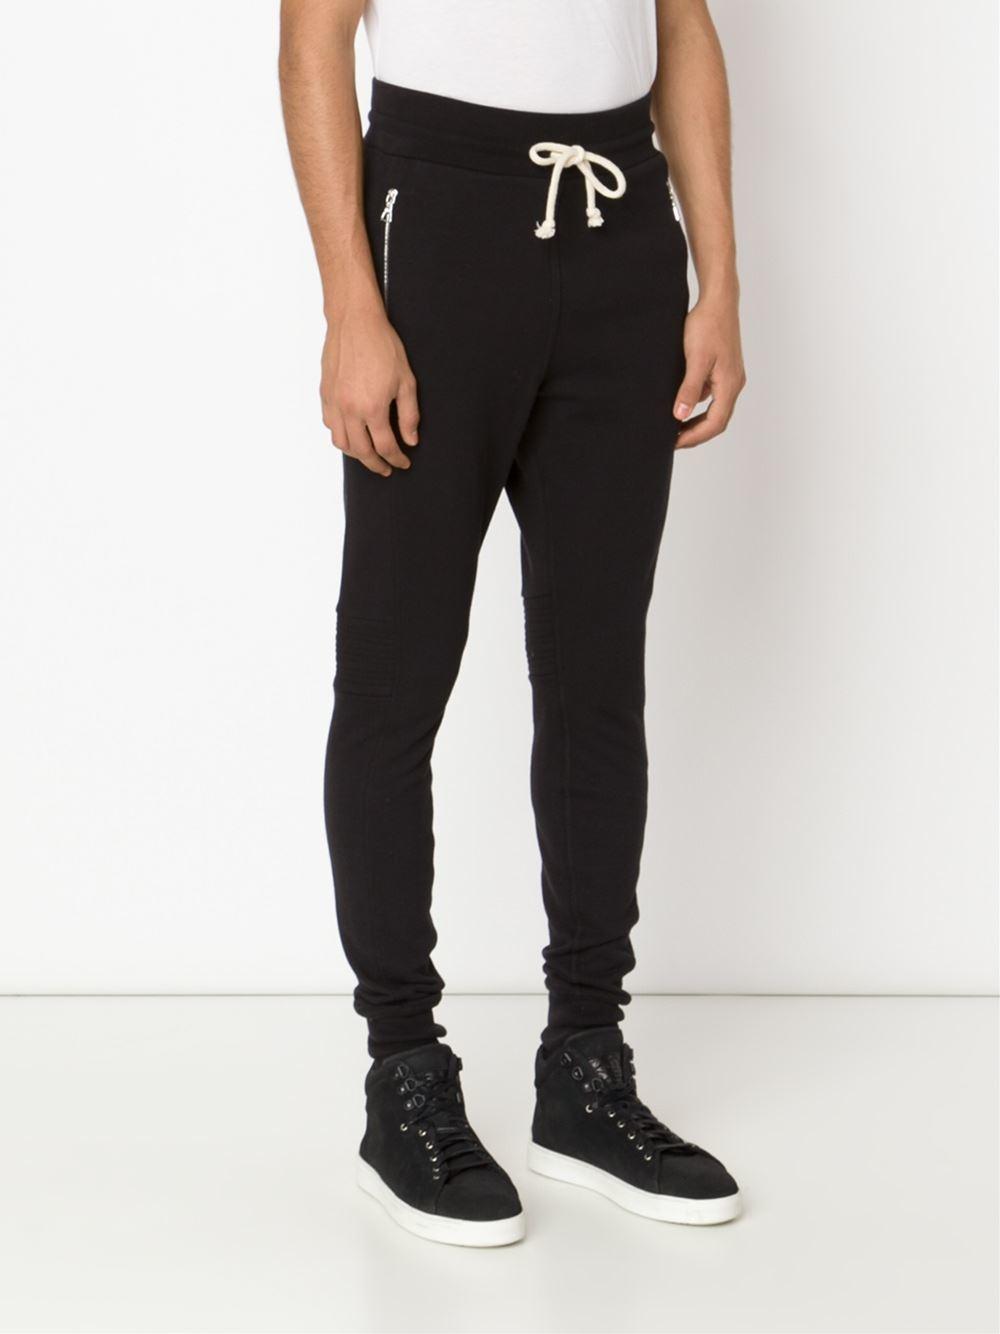 Escobar Sweatpants in Black John Elliott + Co Original Amazon Sale Online Cheap Geniue Stockist Cheap Newest OYFPqMJ